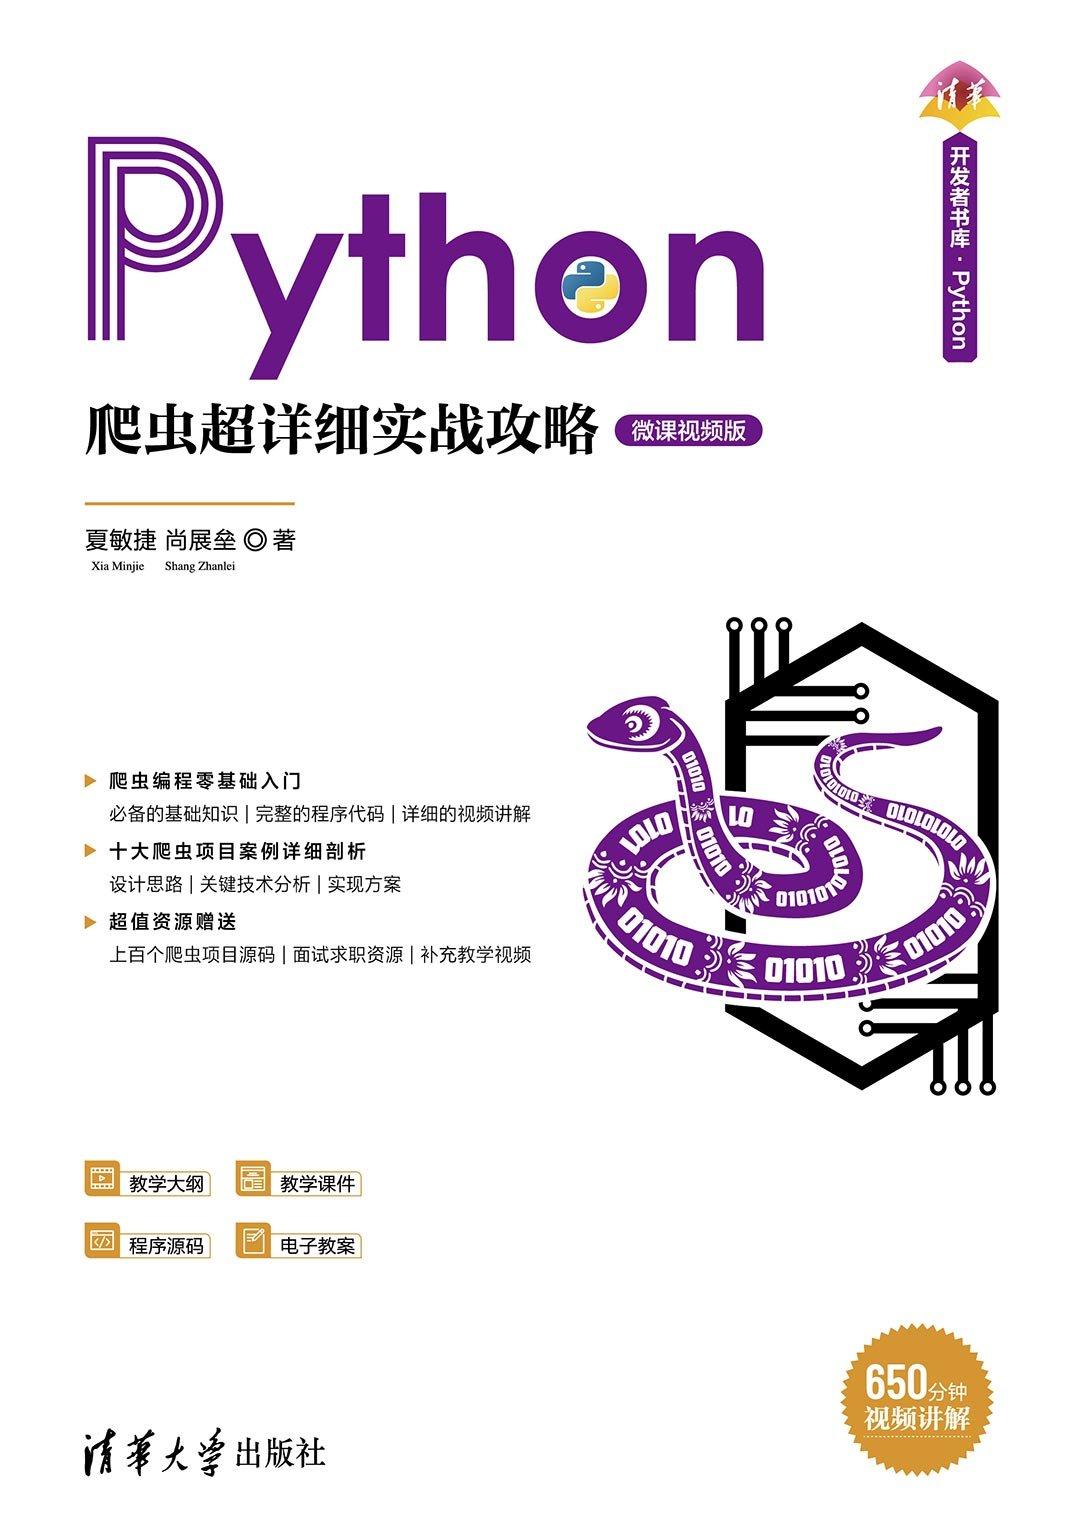 Python爬蟲超詳細實戰攻略-微課視頻版-preview-1